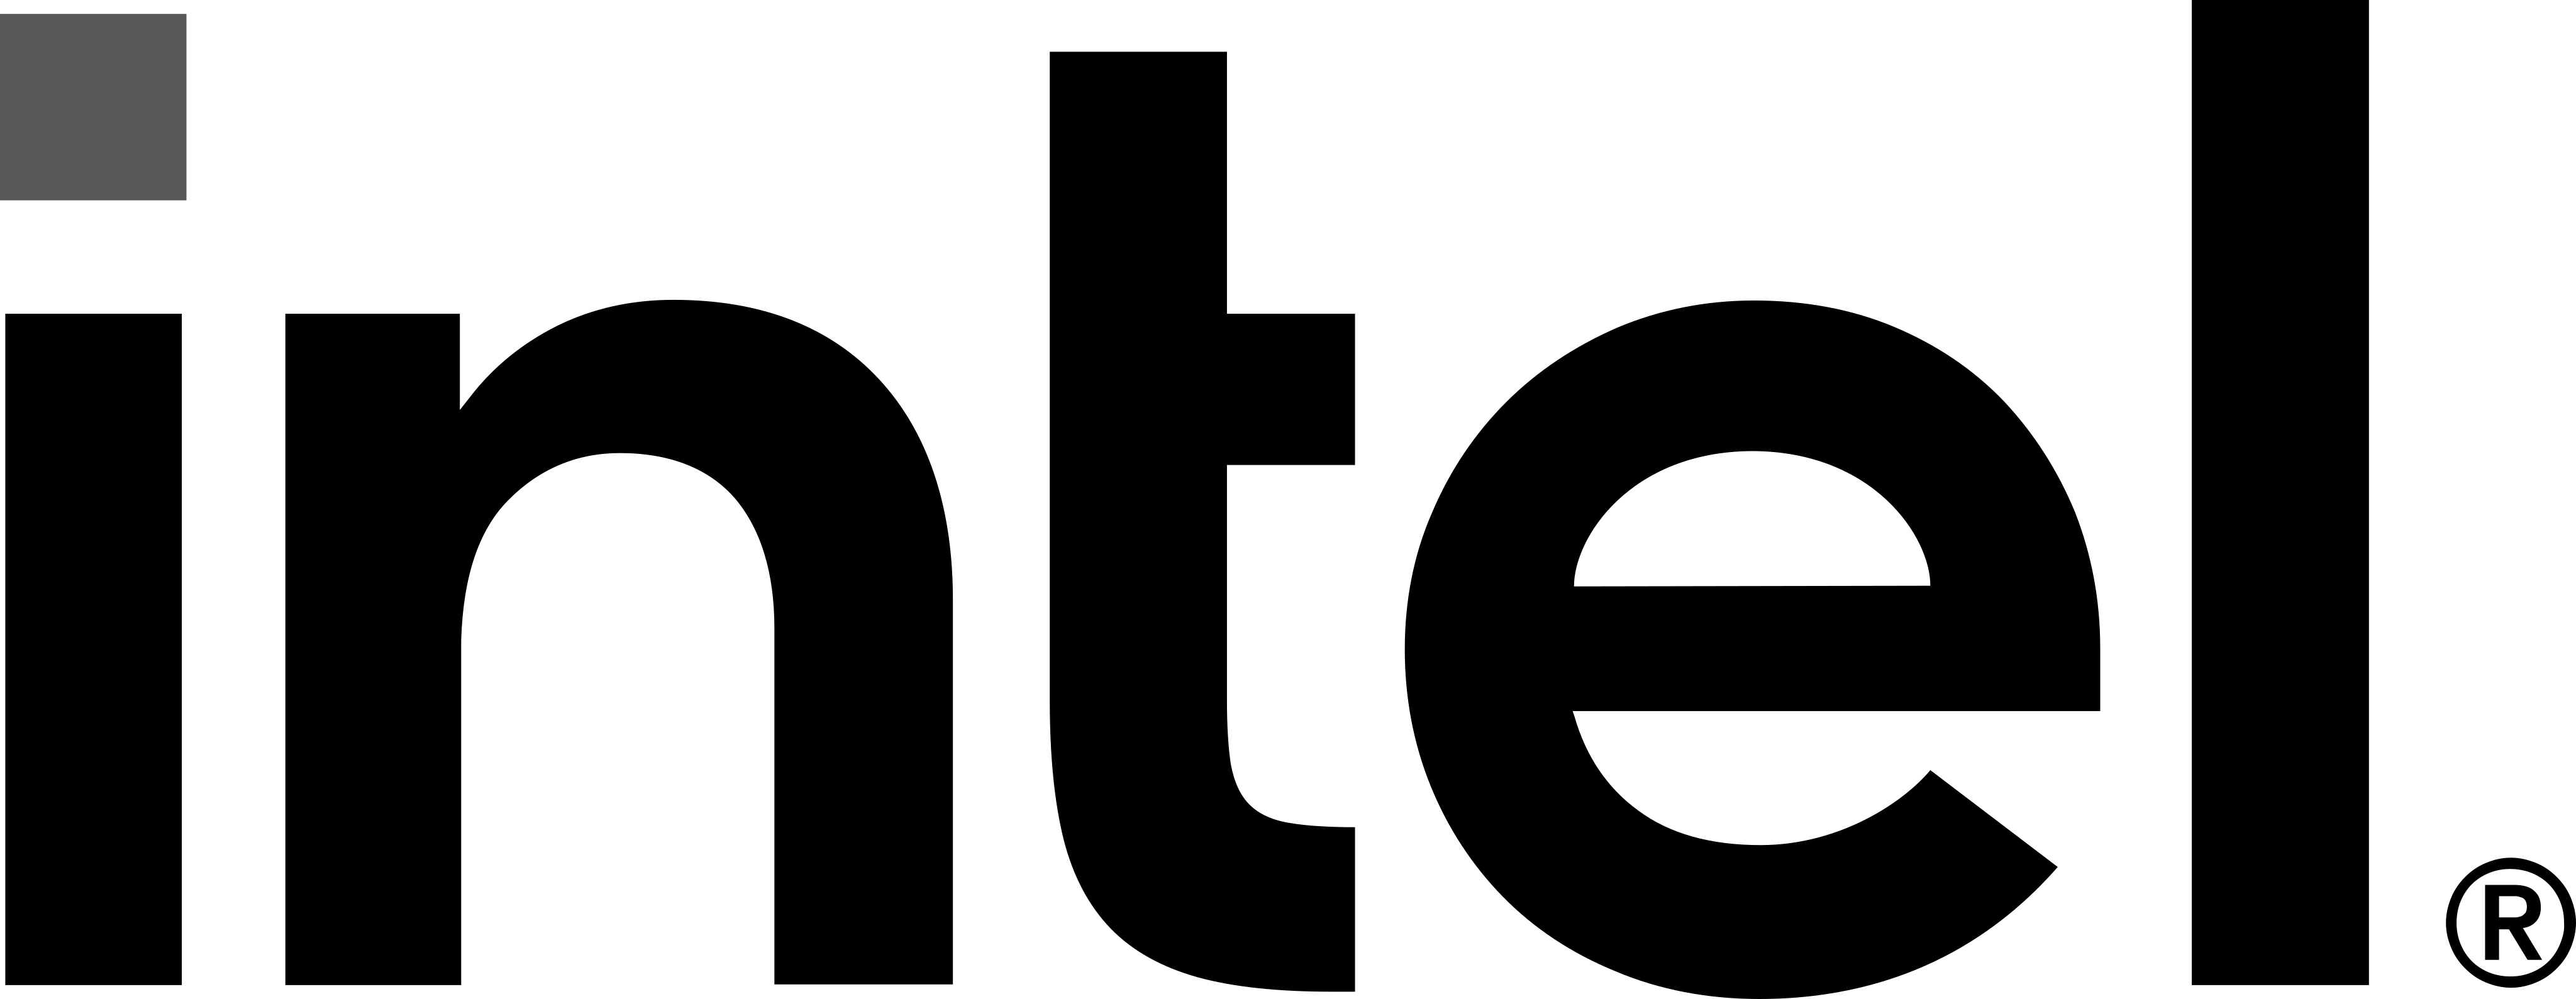 intel logo black